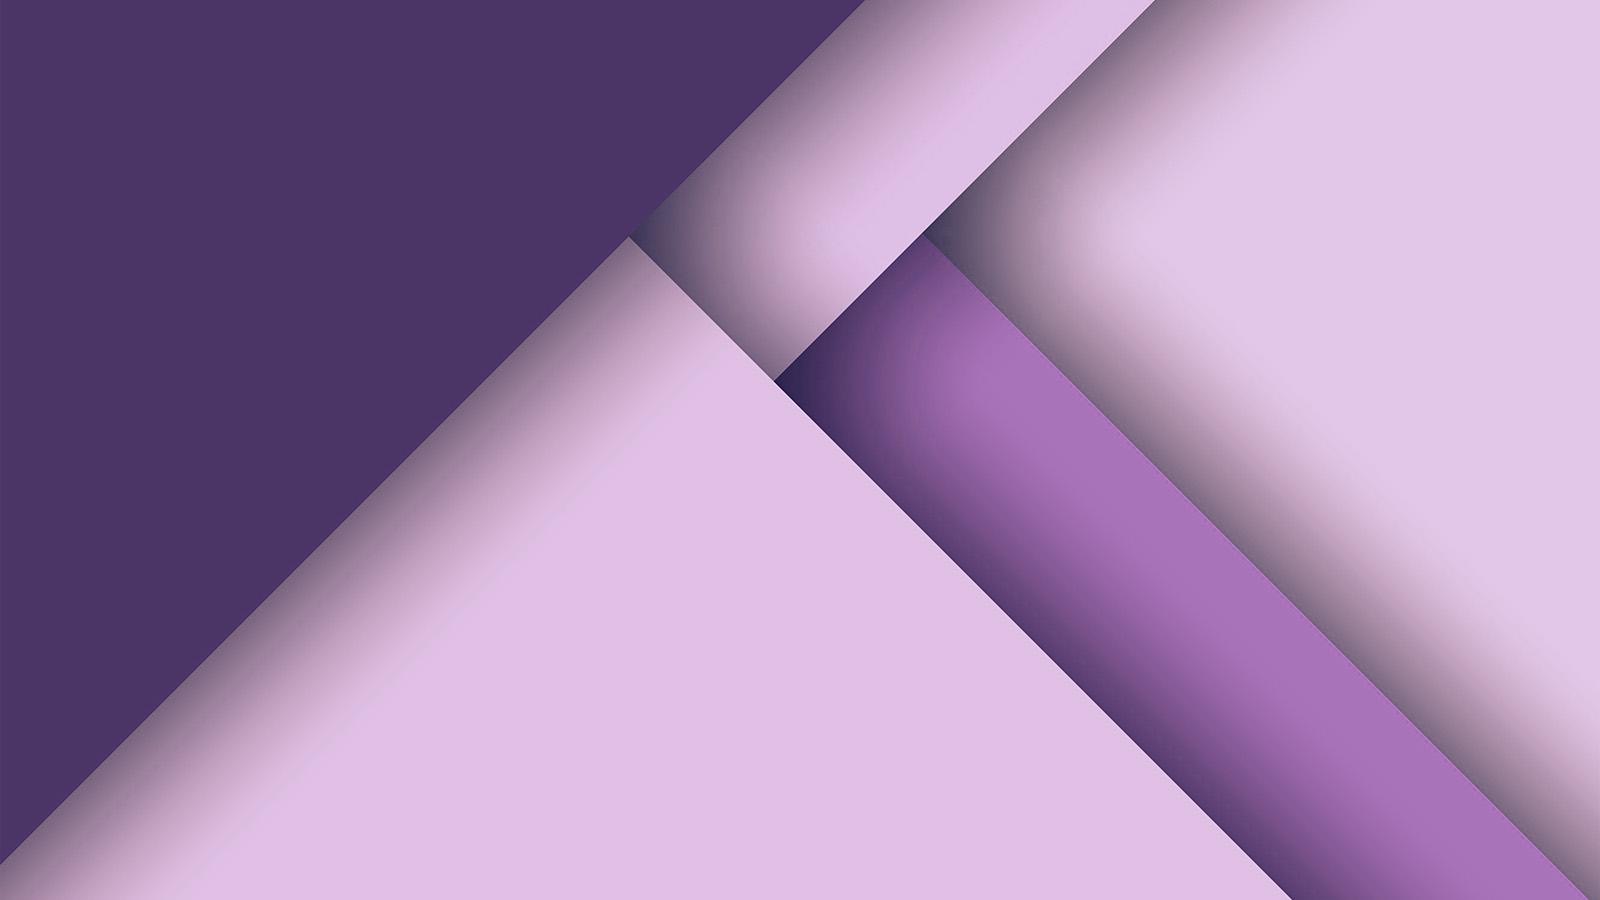 Fall Wallpaper For Iphone 7 Plus Vk87 Lollipop Background Purple Flat Material Pattern